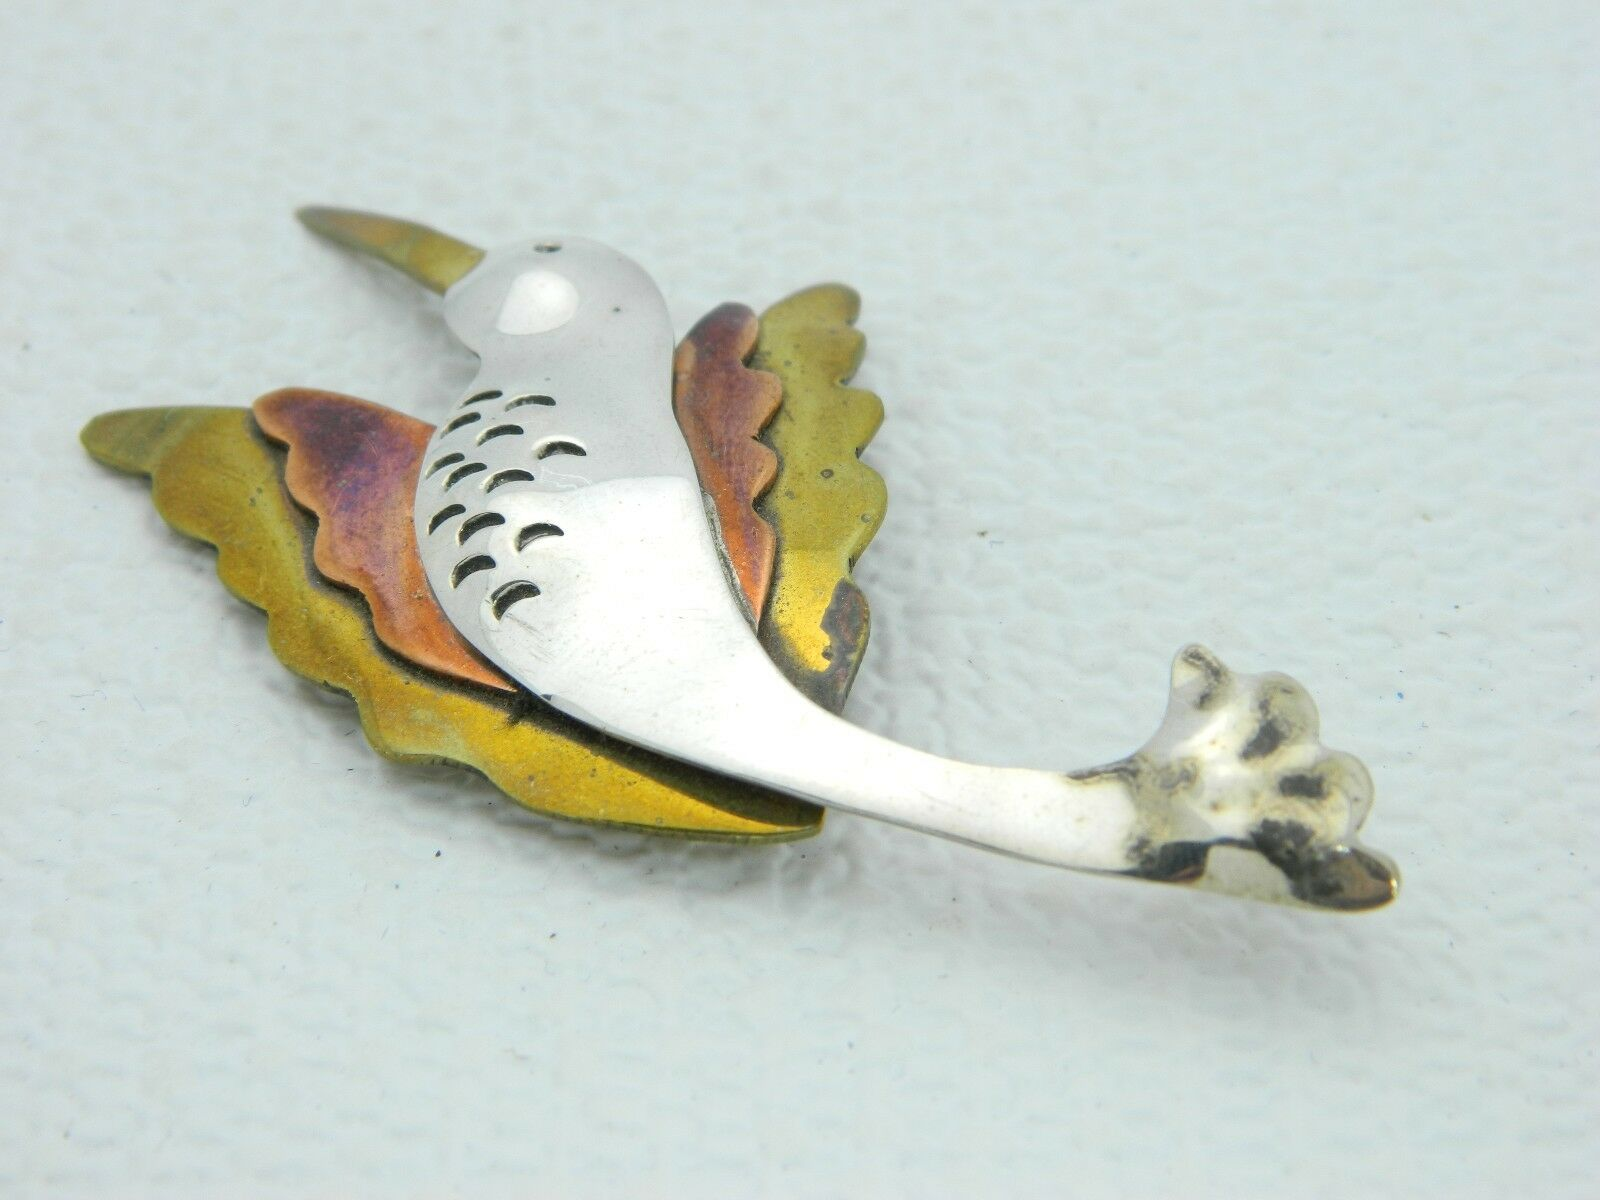 VTG FAR ETCHED Multi-Tone Multi-Metal Bird Pin Brooch